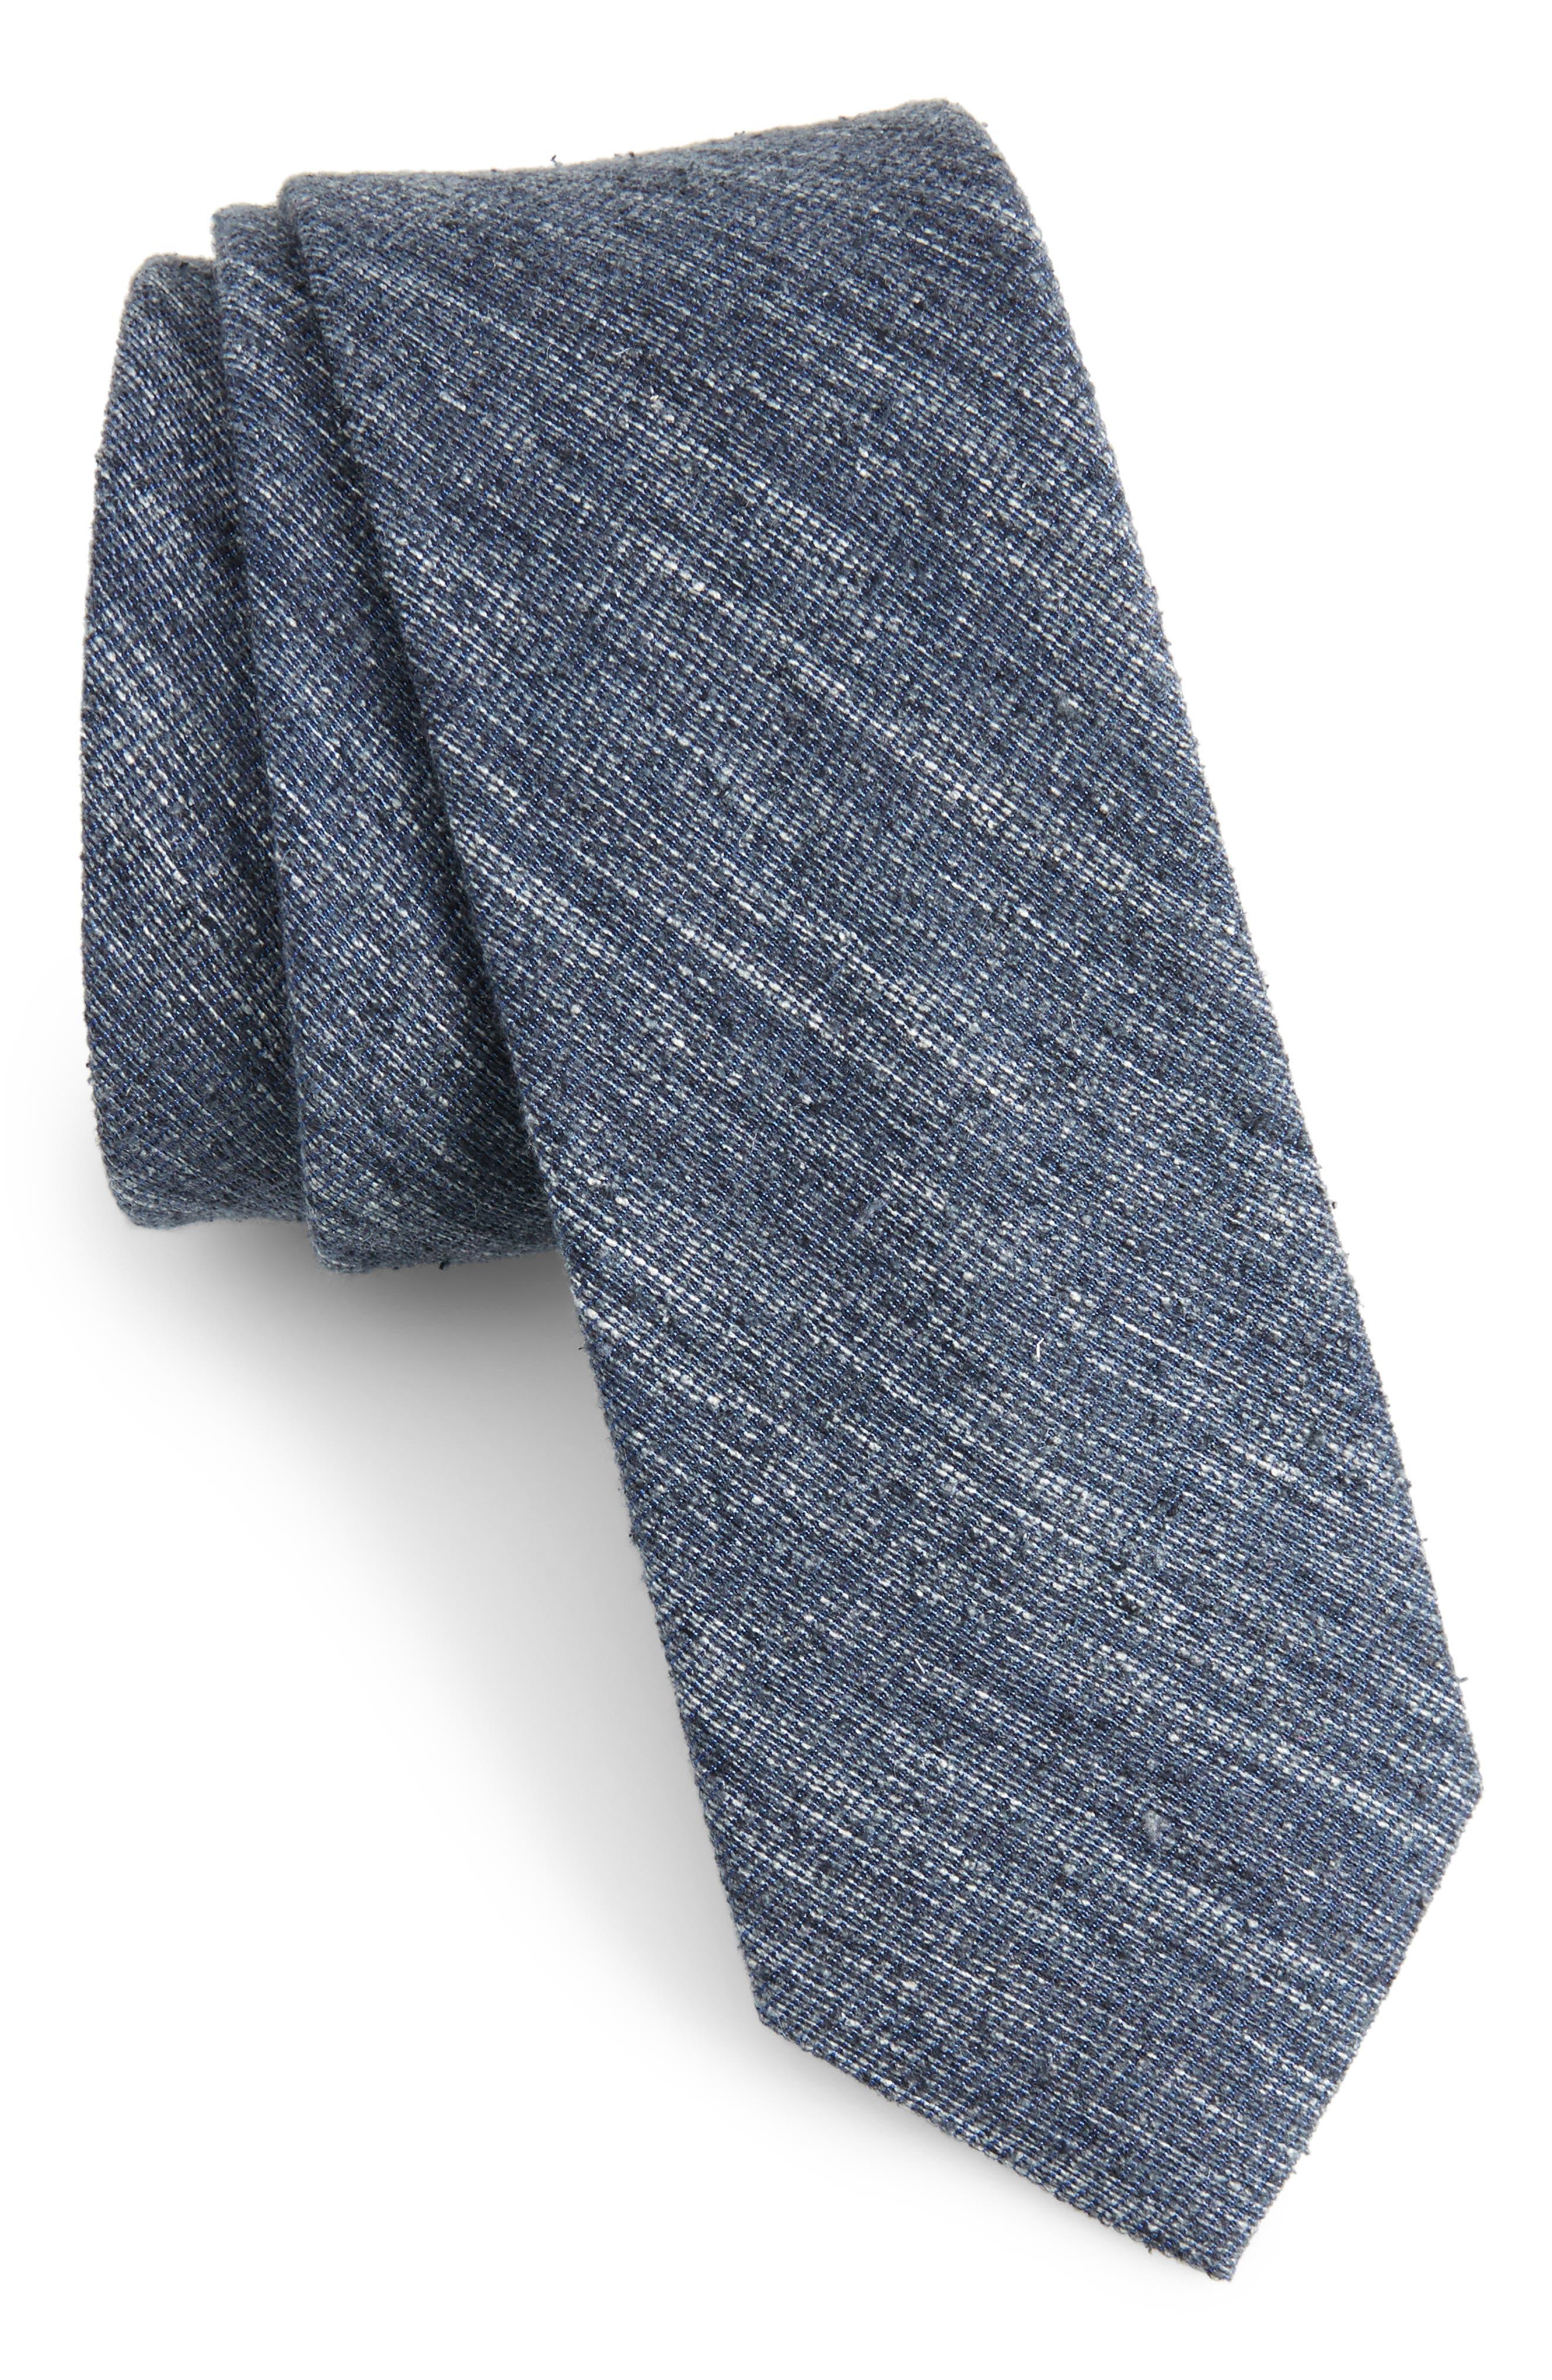 West Ridge Silk Skinny Tie,                         Main,                         color, Navy